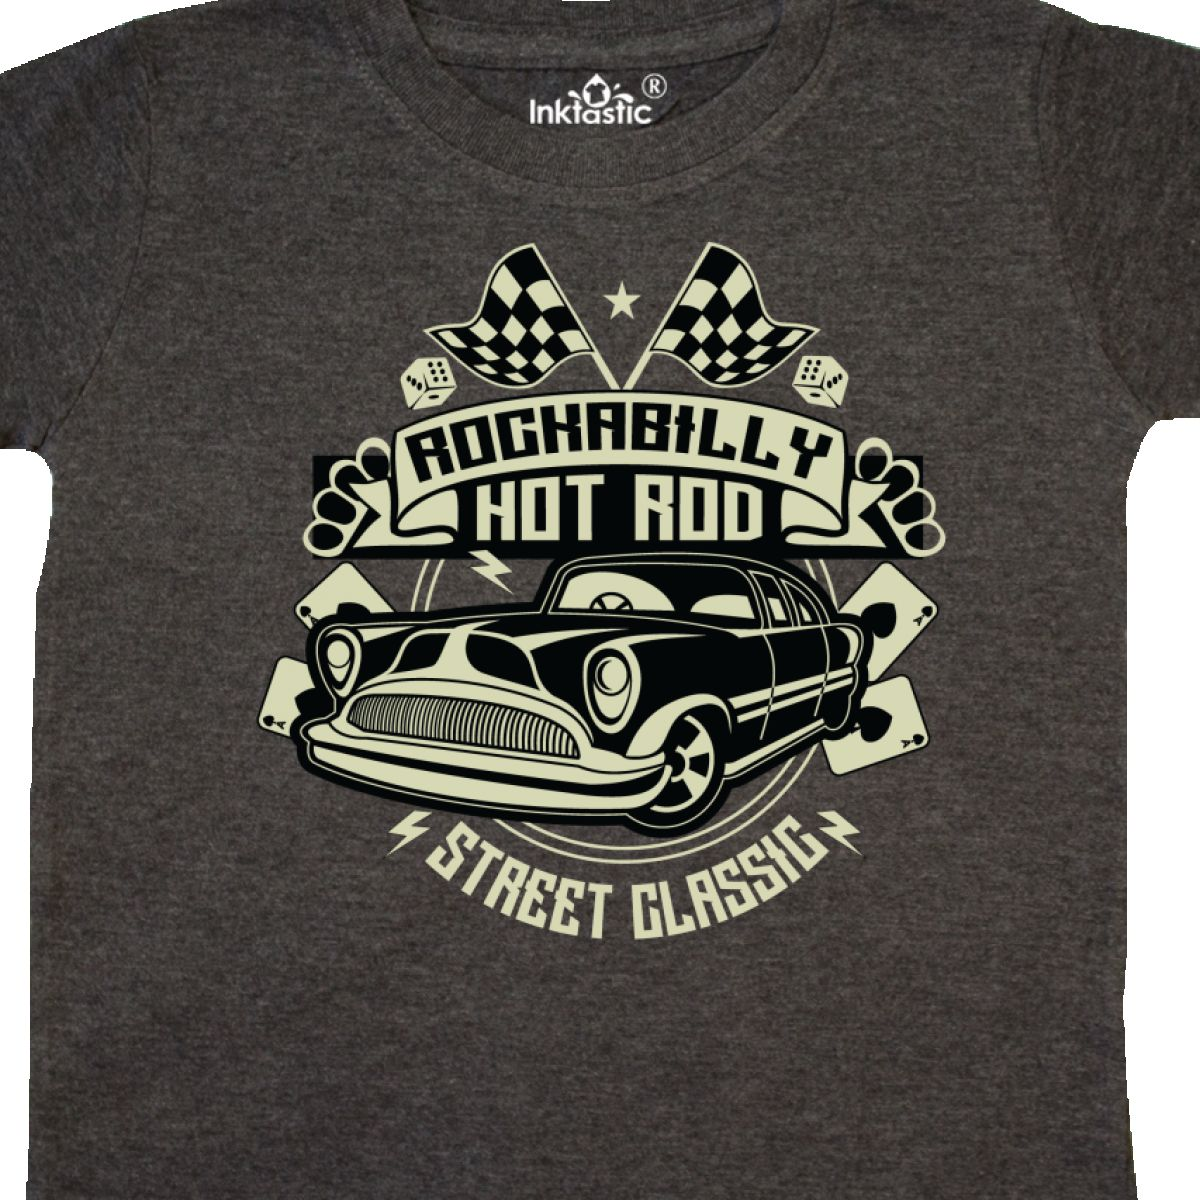 Inktastic Rockabilly Hotrod Toddler T-Shirt Hot Rod Vintage Car Racing Street